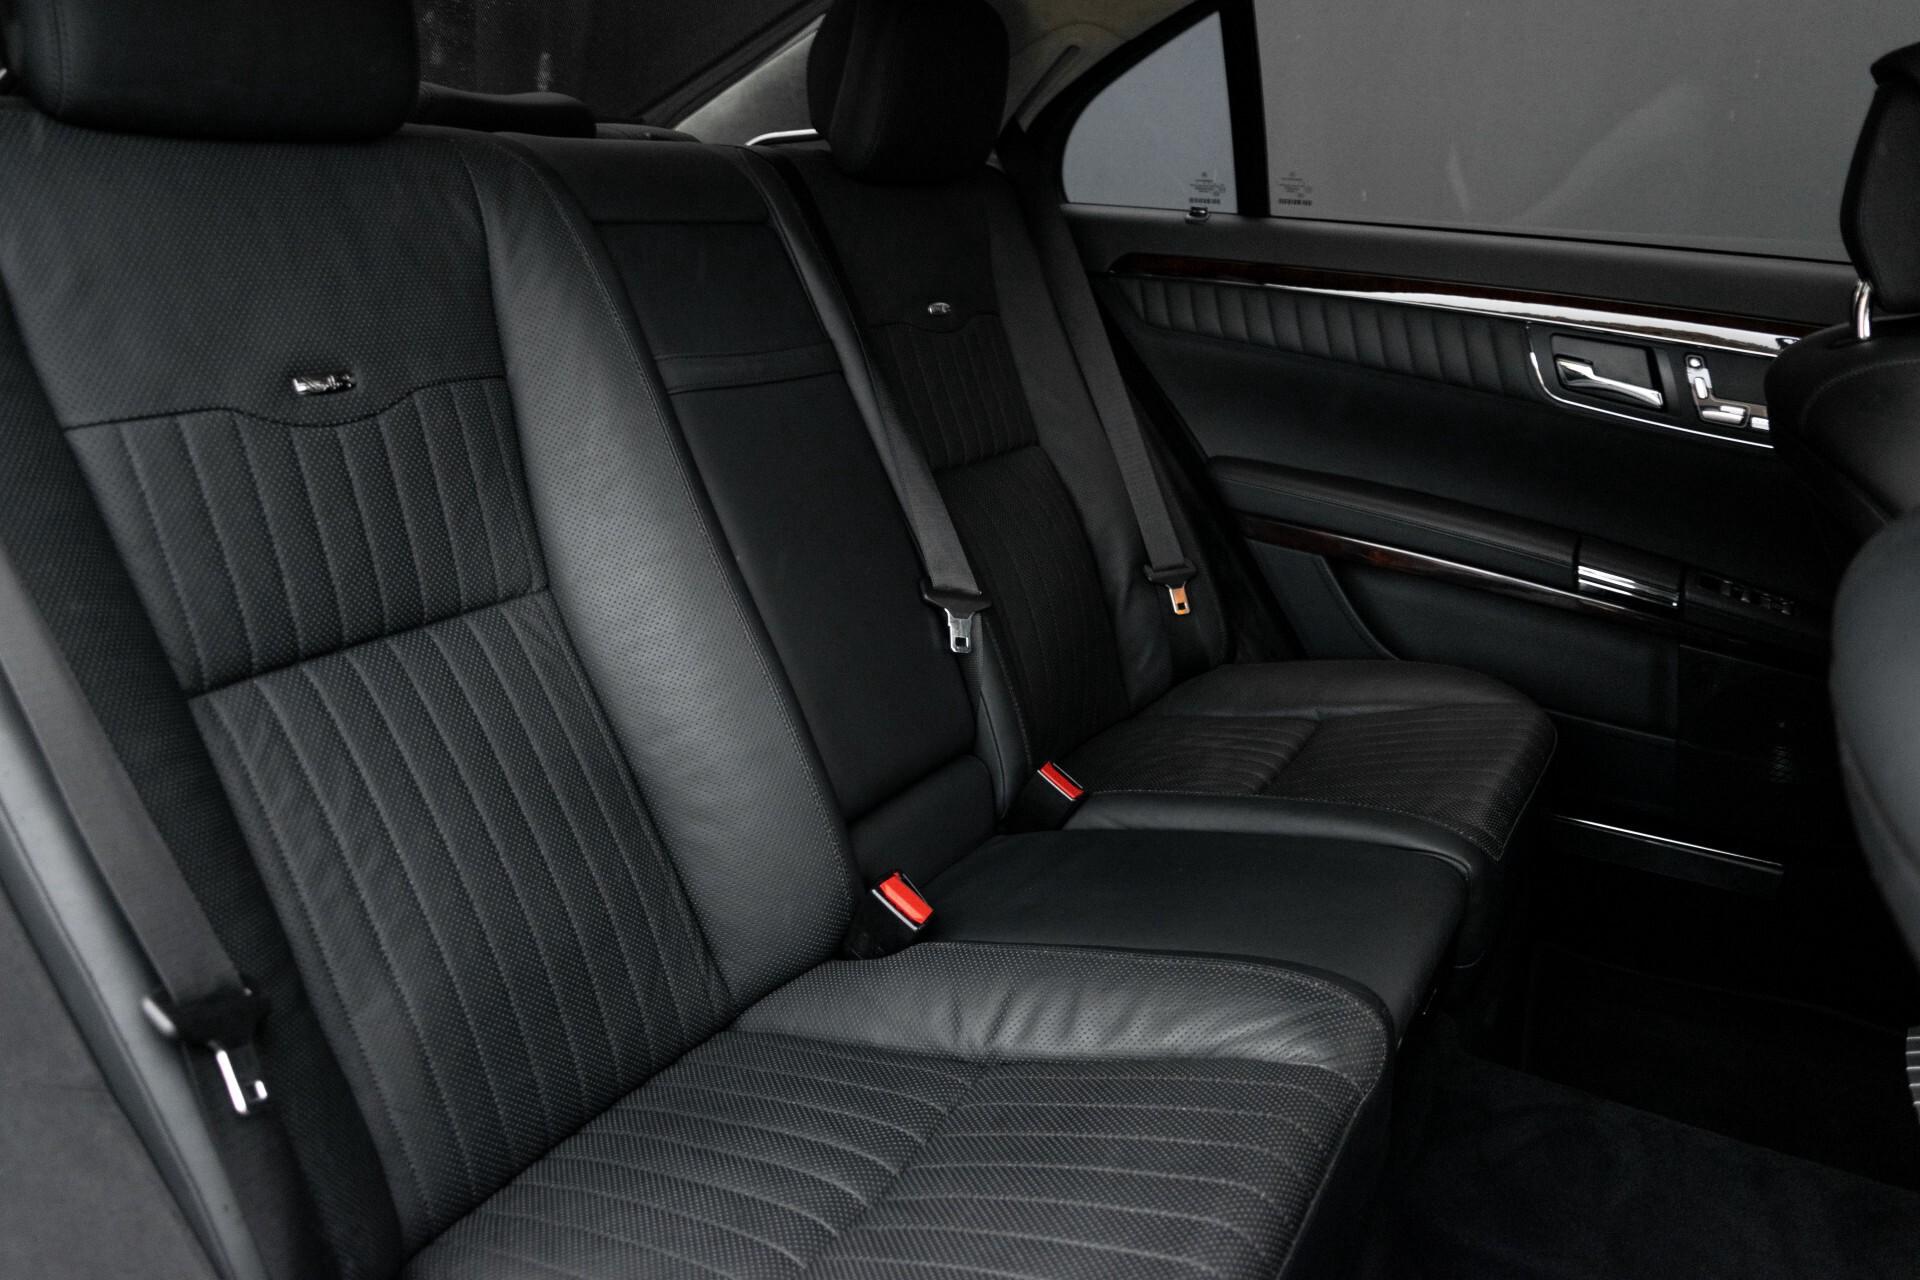 Mercedes-Benz S-Klasse 600 Lang 65 AMG Bi-Turbo Prestige Plus Aut5 Foto 5